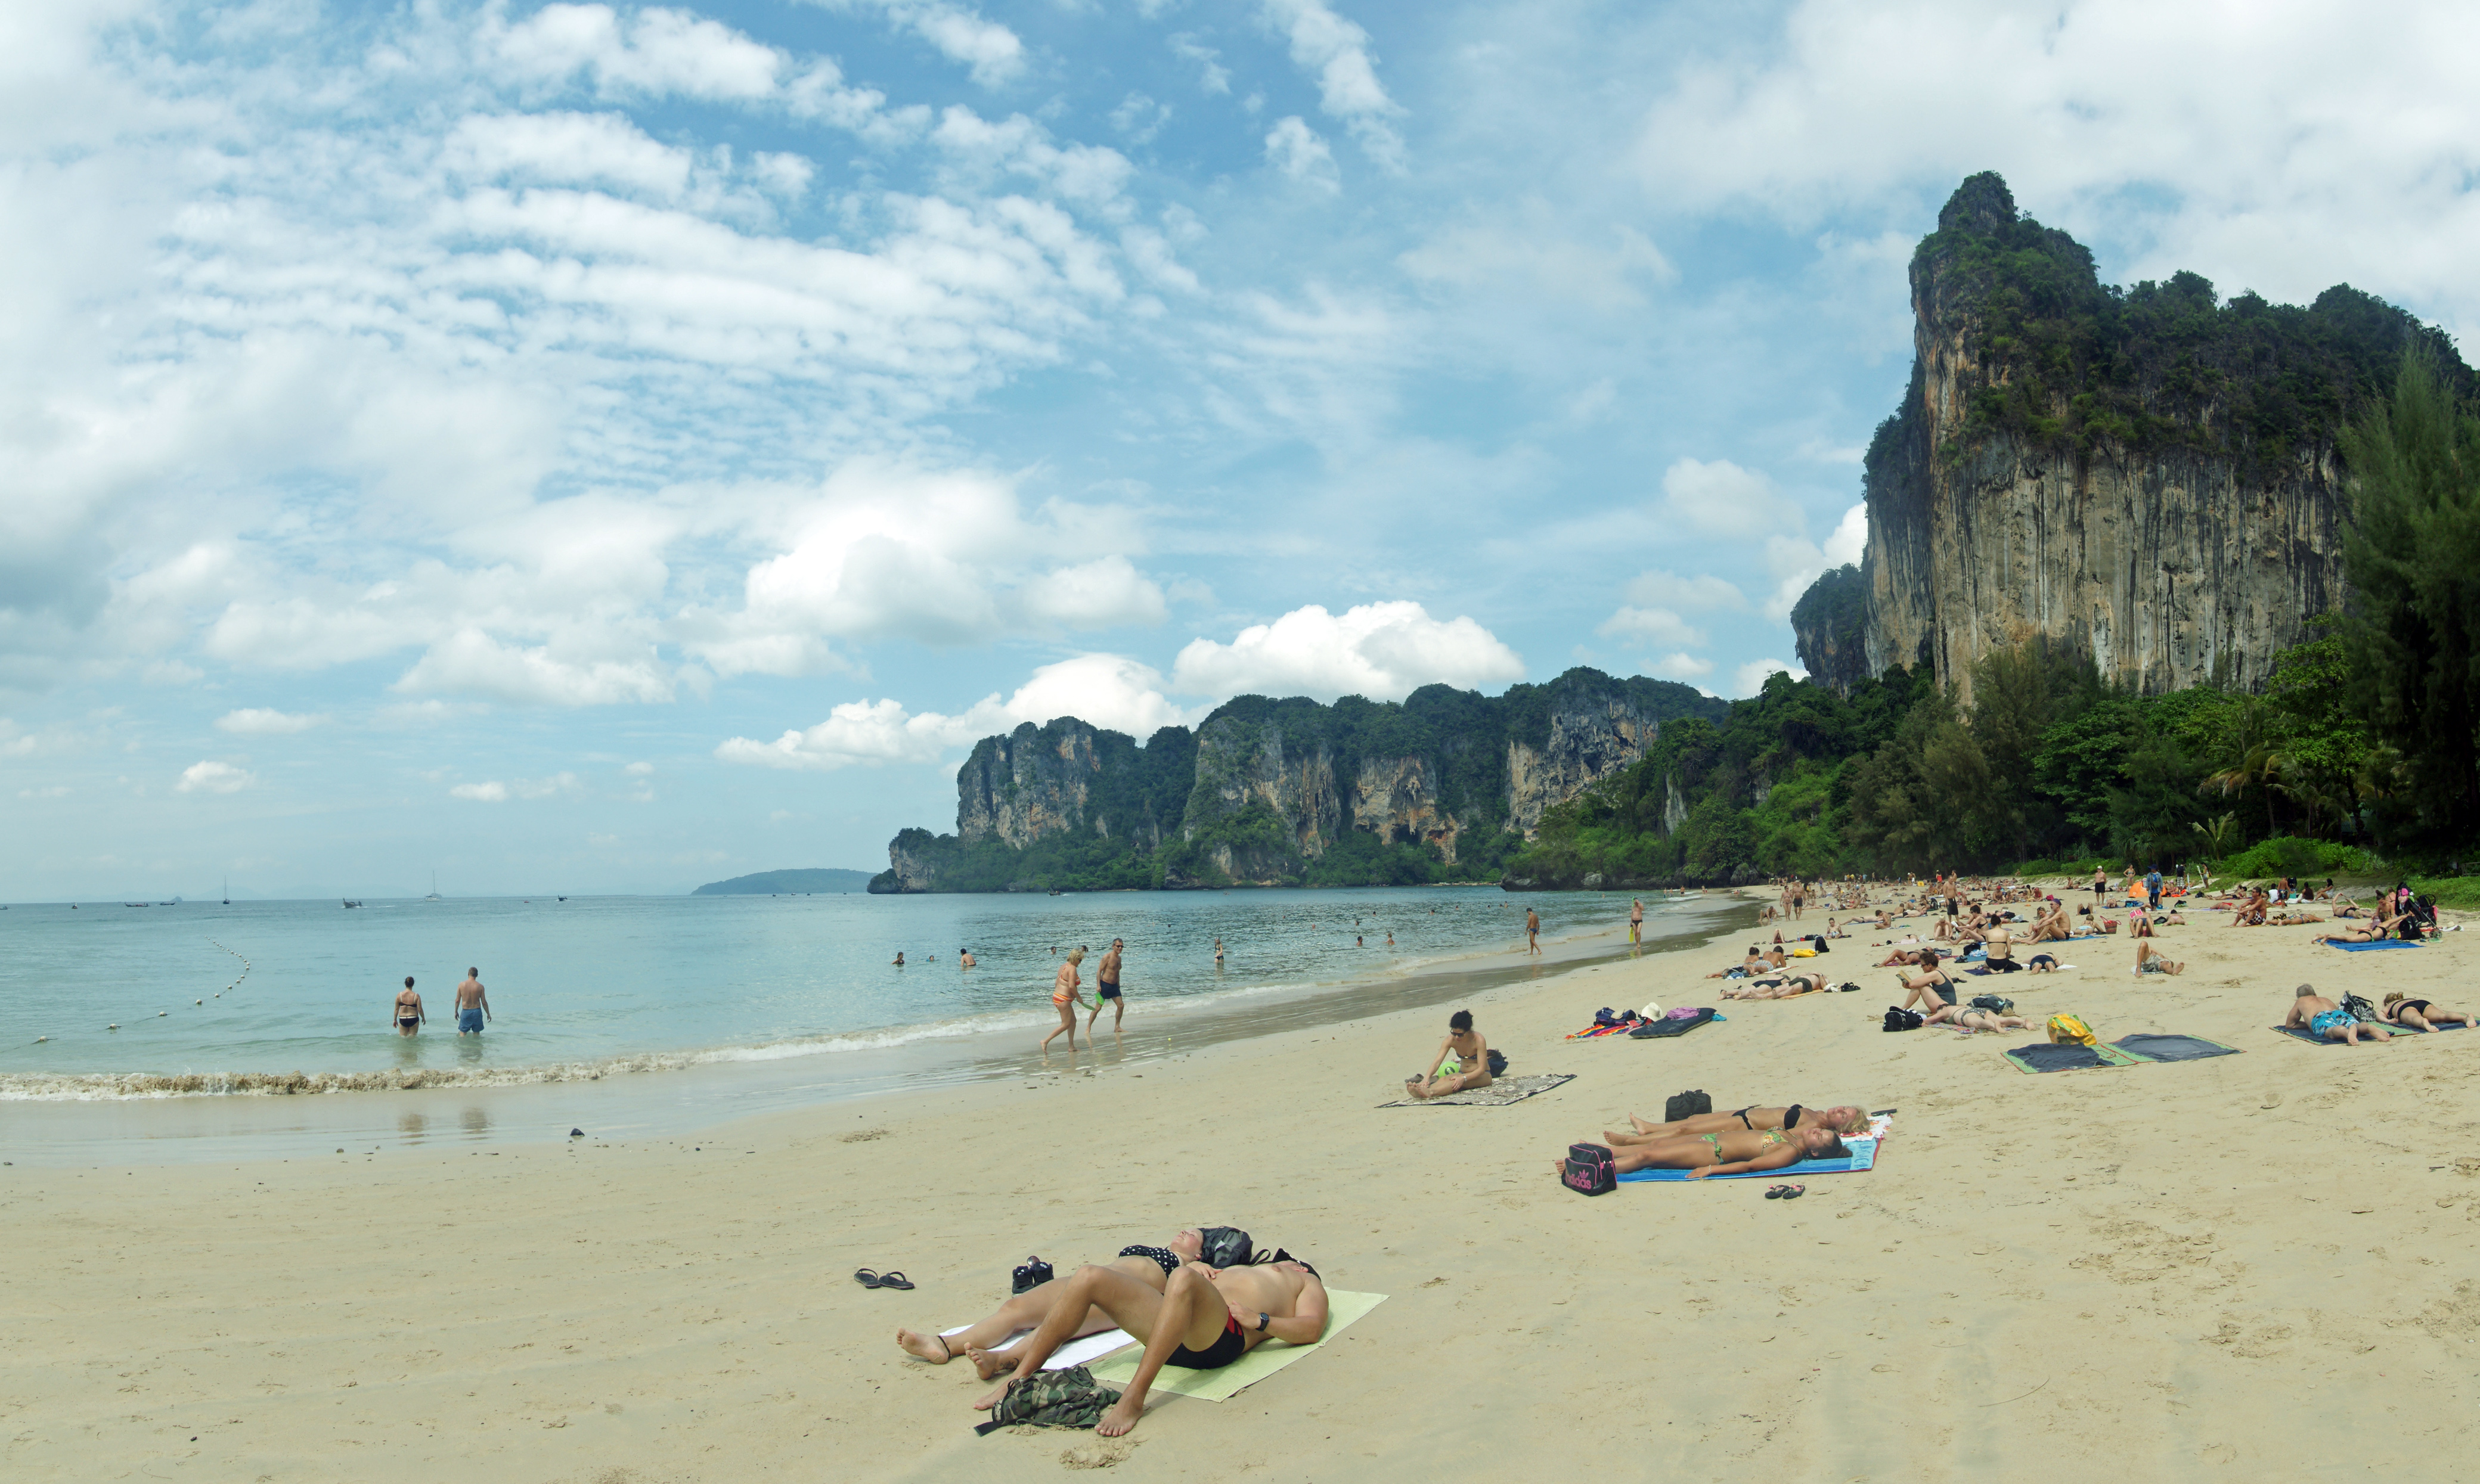 Rai Leh Beach Krabi, Thailand - Location, Facts, History ...